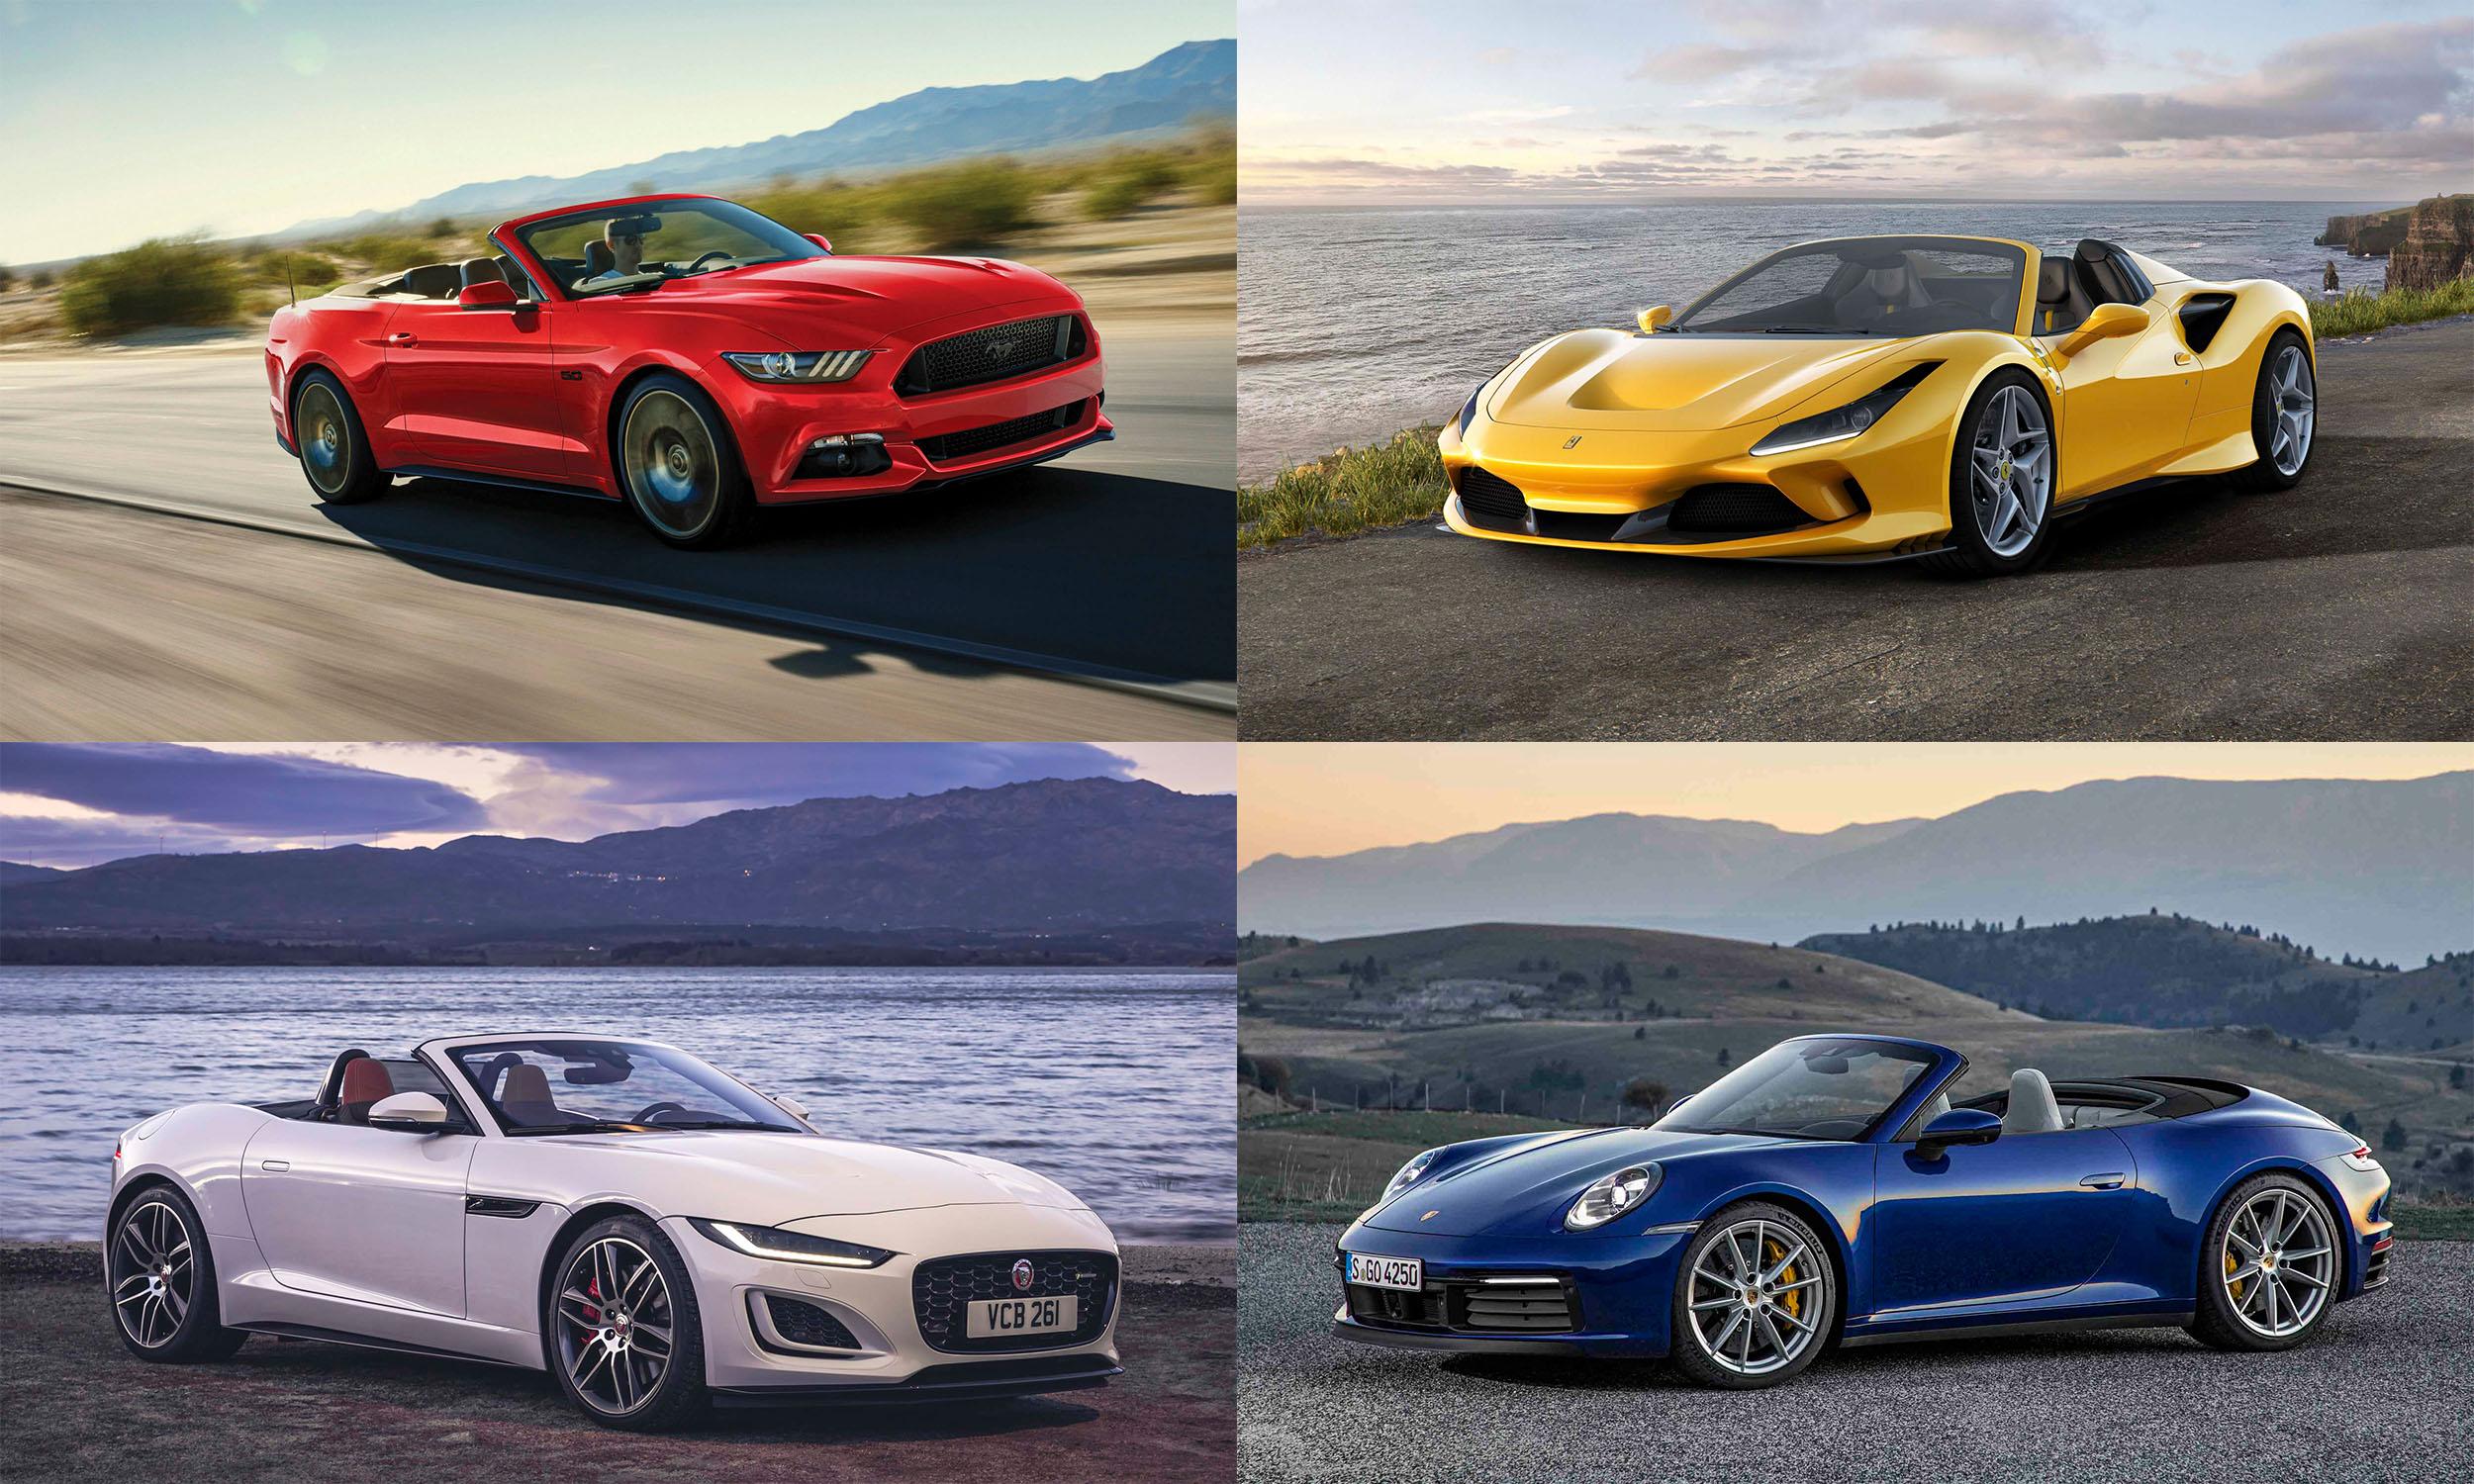 Convertible Sports Cars Fun in the Sunnbsp